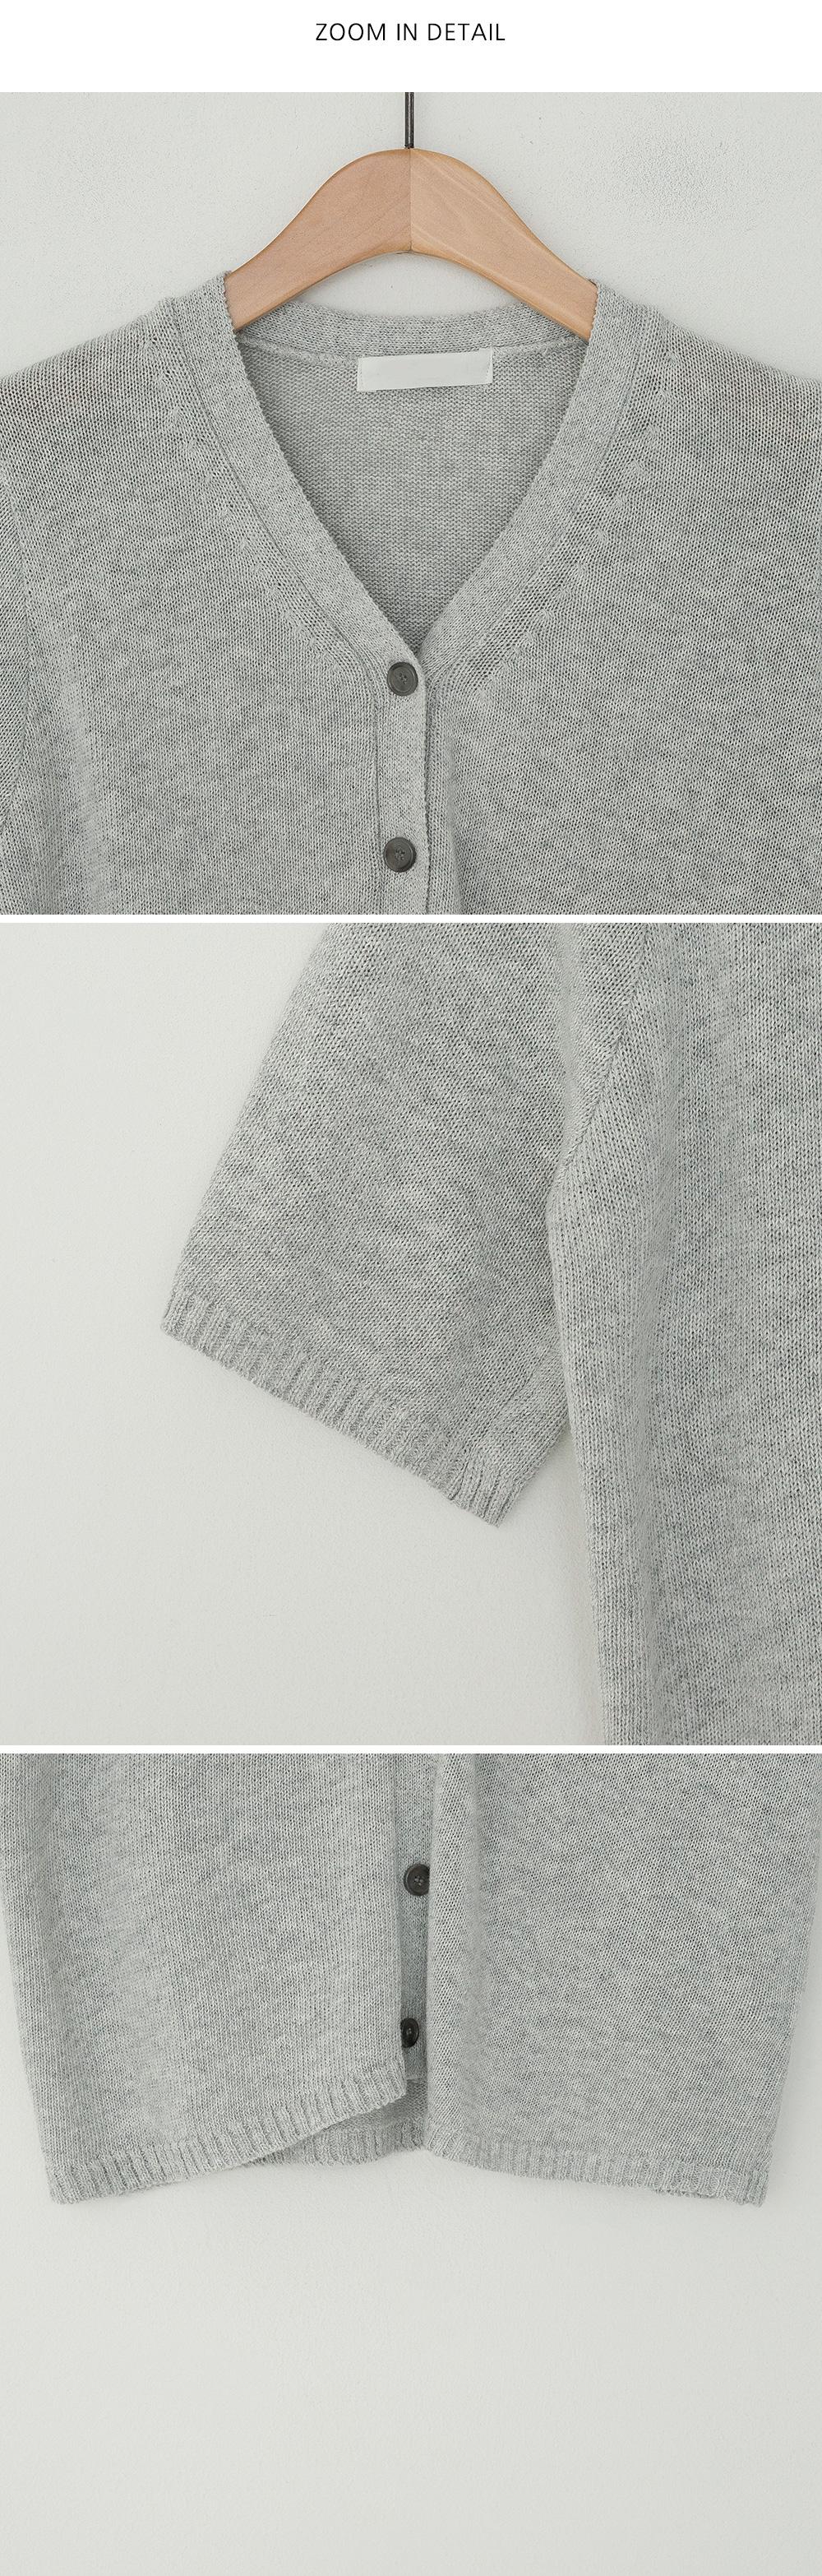 Varden Italian Cotton Short Sleeve Cardigan